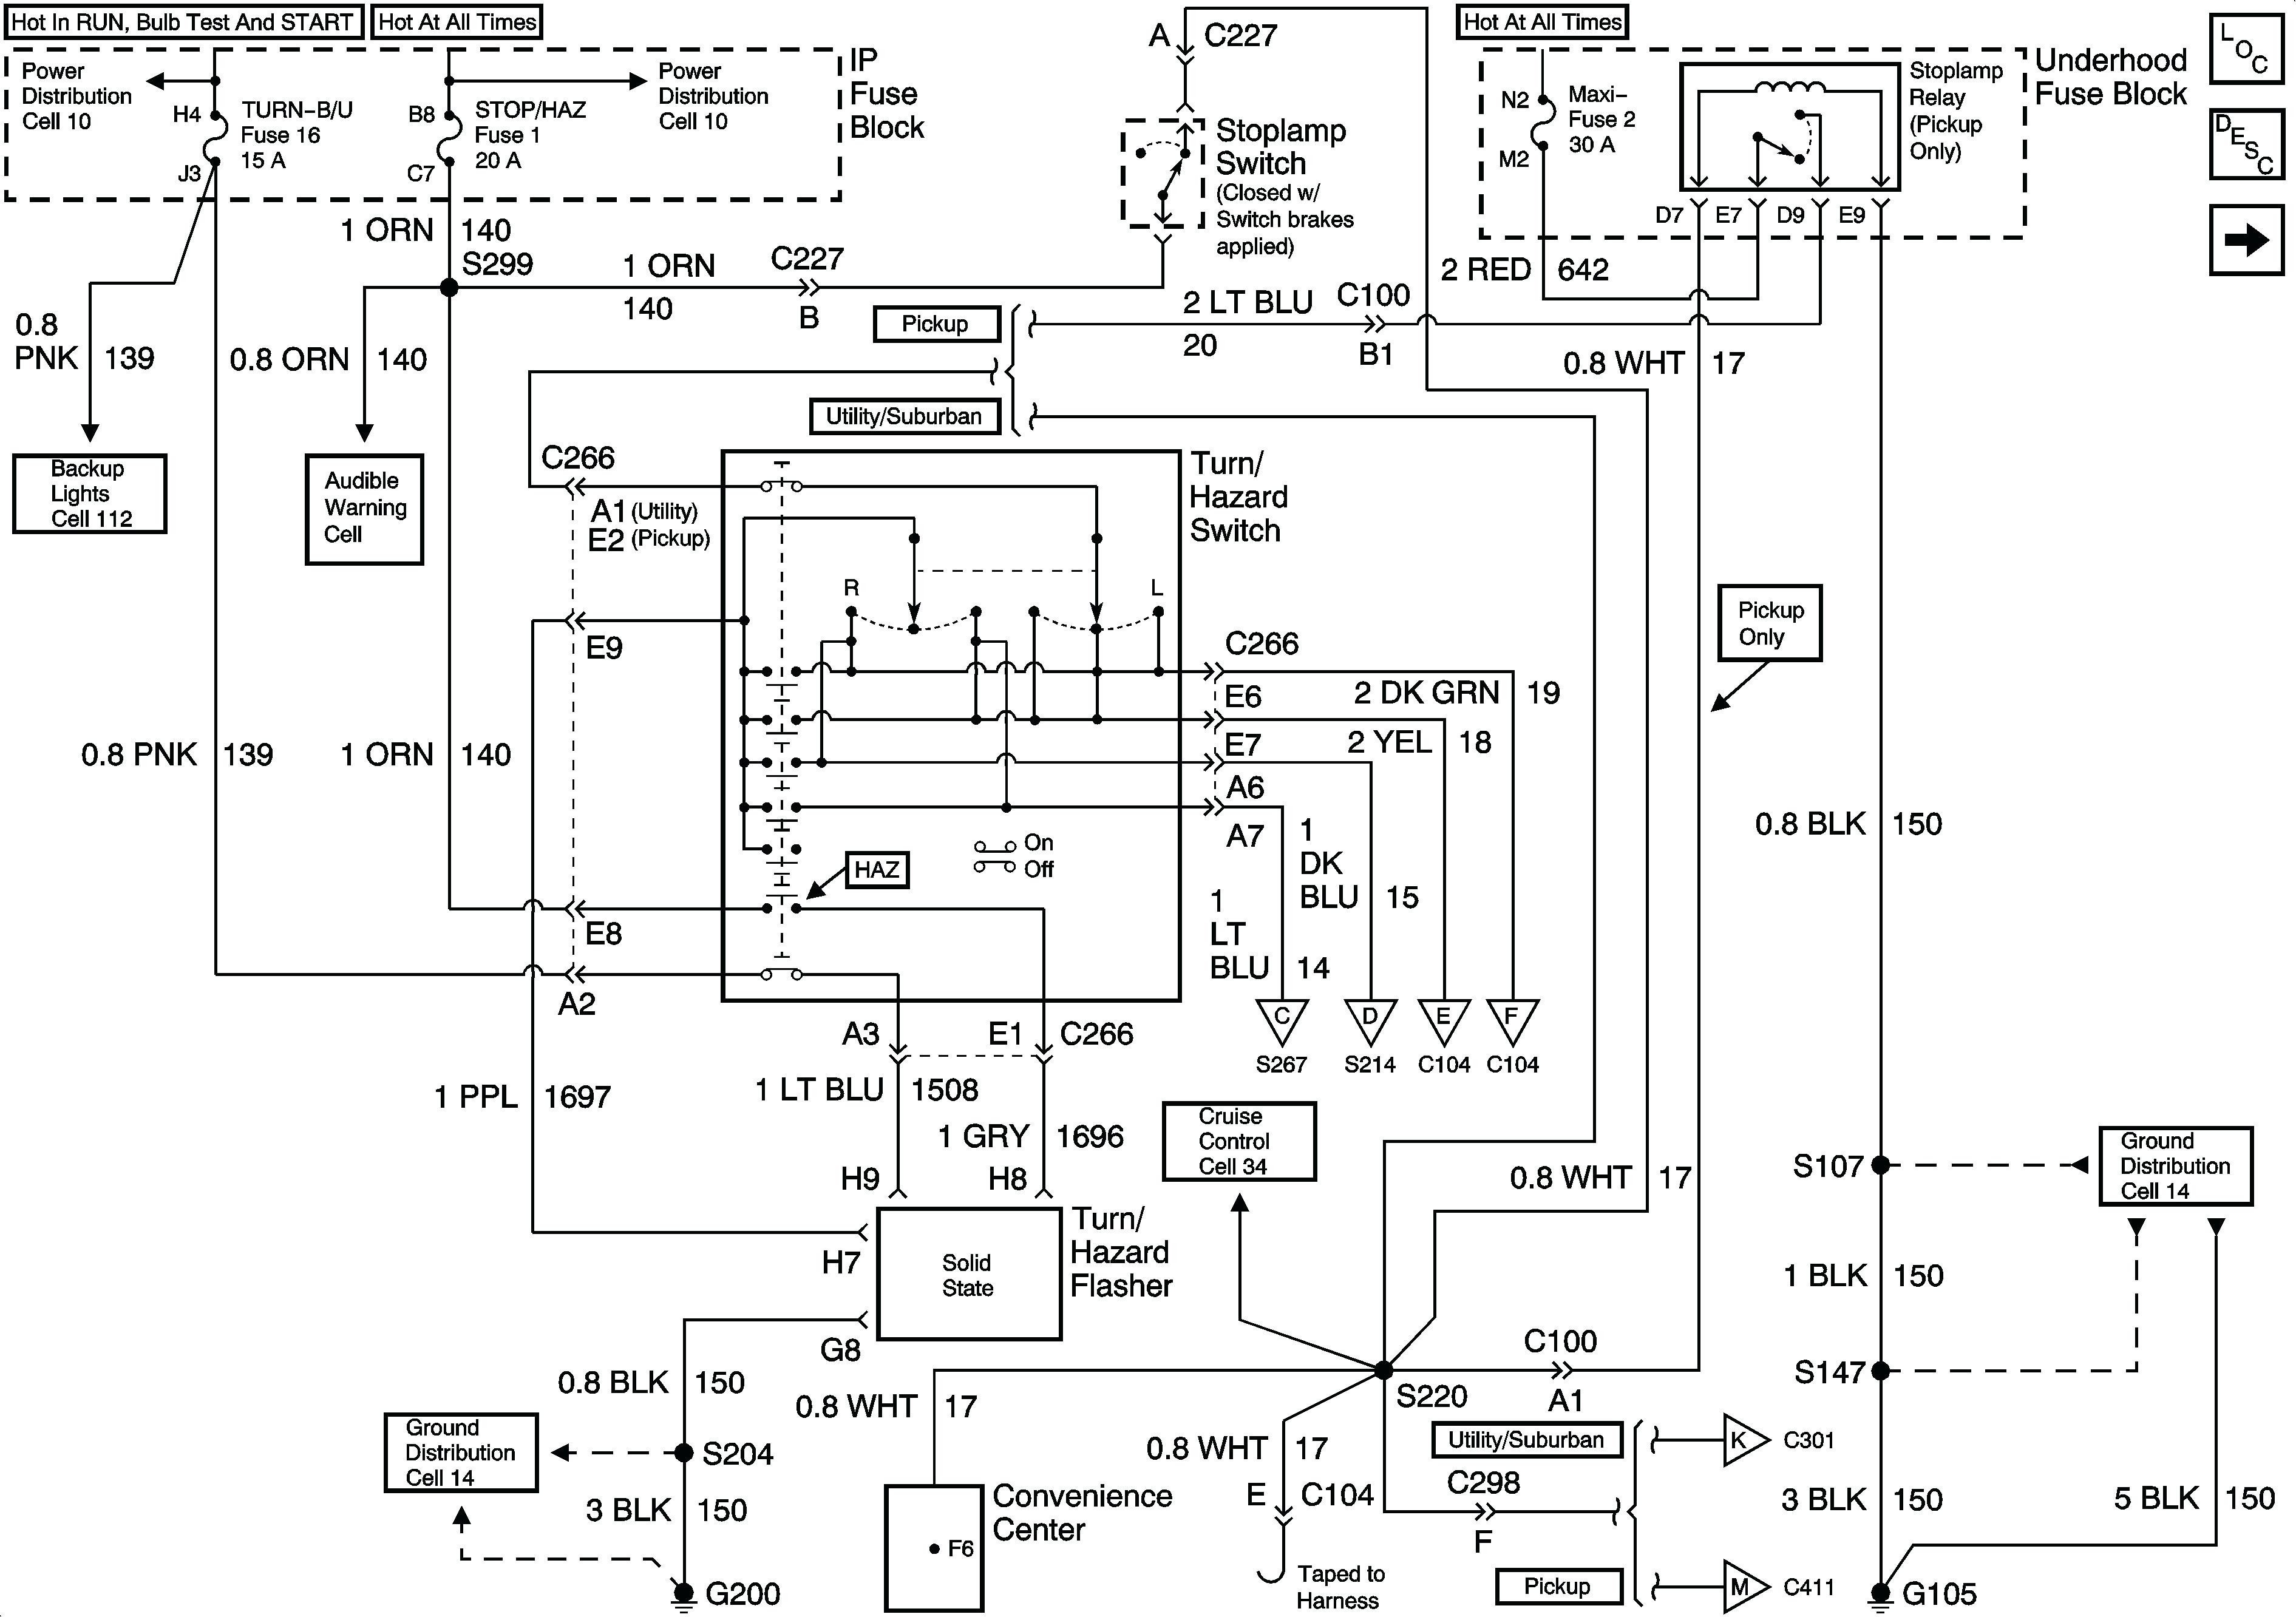 2004 Kia Rio Engine Diagram Gm Ls1 Engine Wiring Diagram Reveolution Wiring Diagram • Of 2004 Kia Rio Engine Diagram